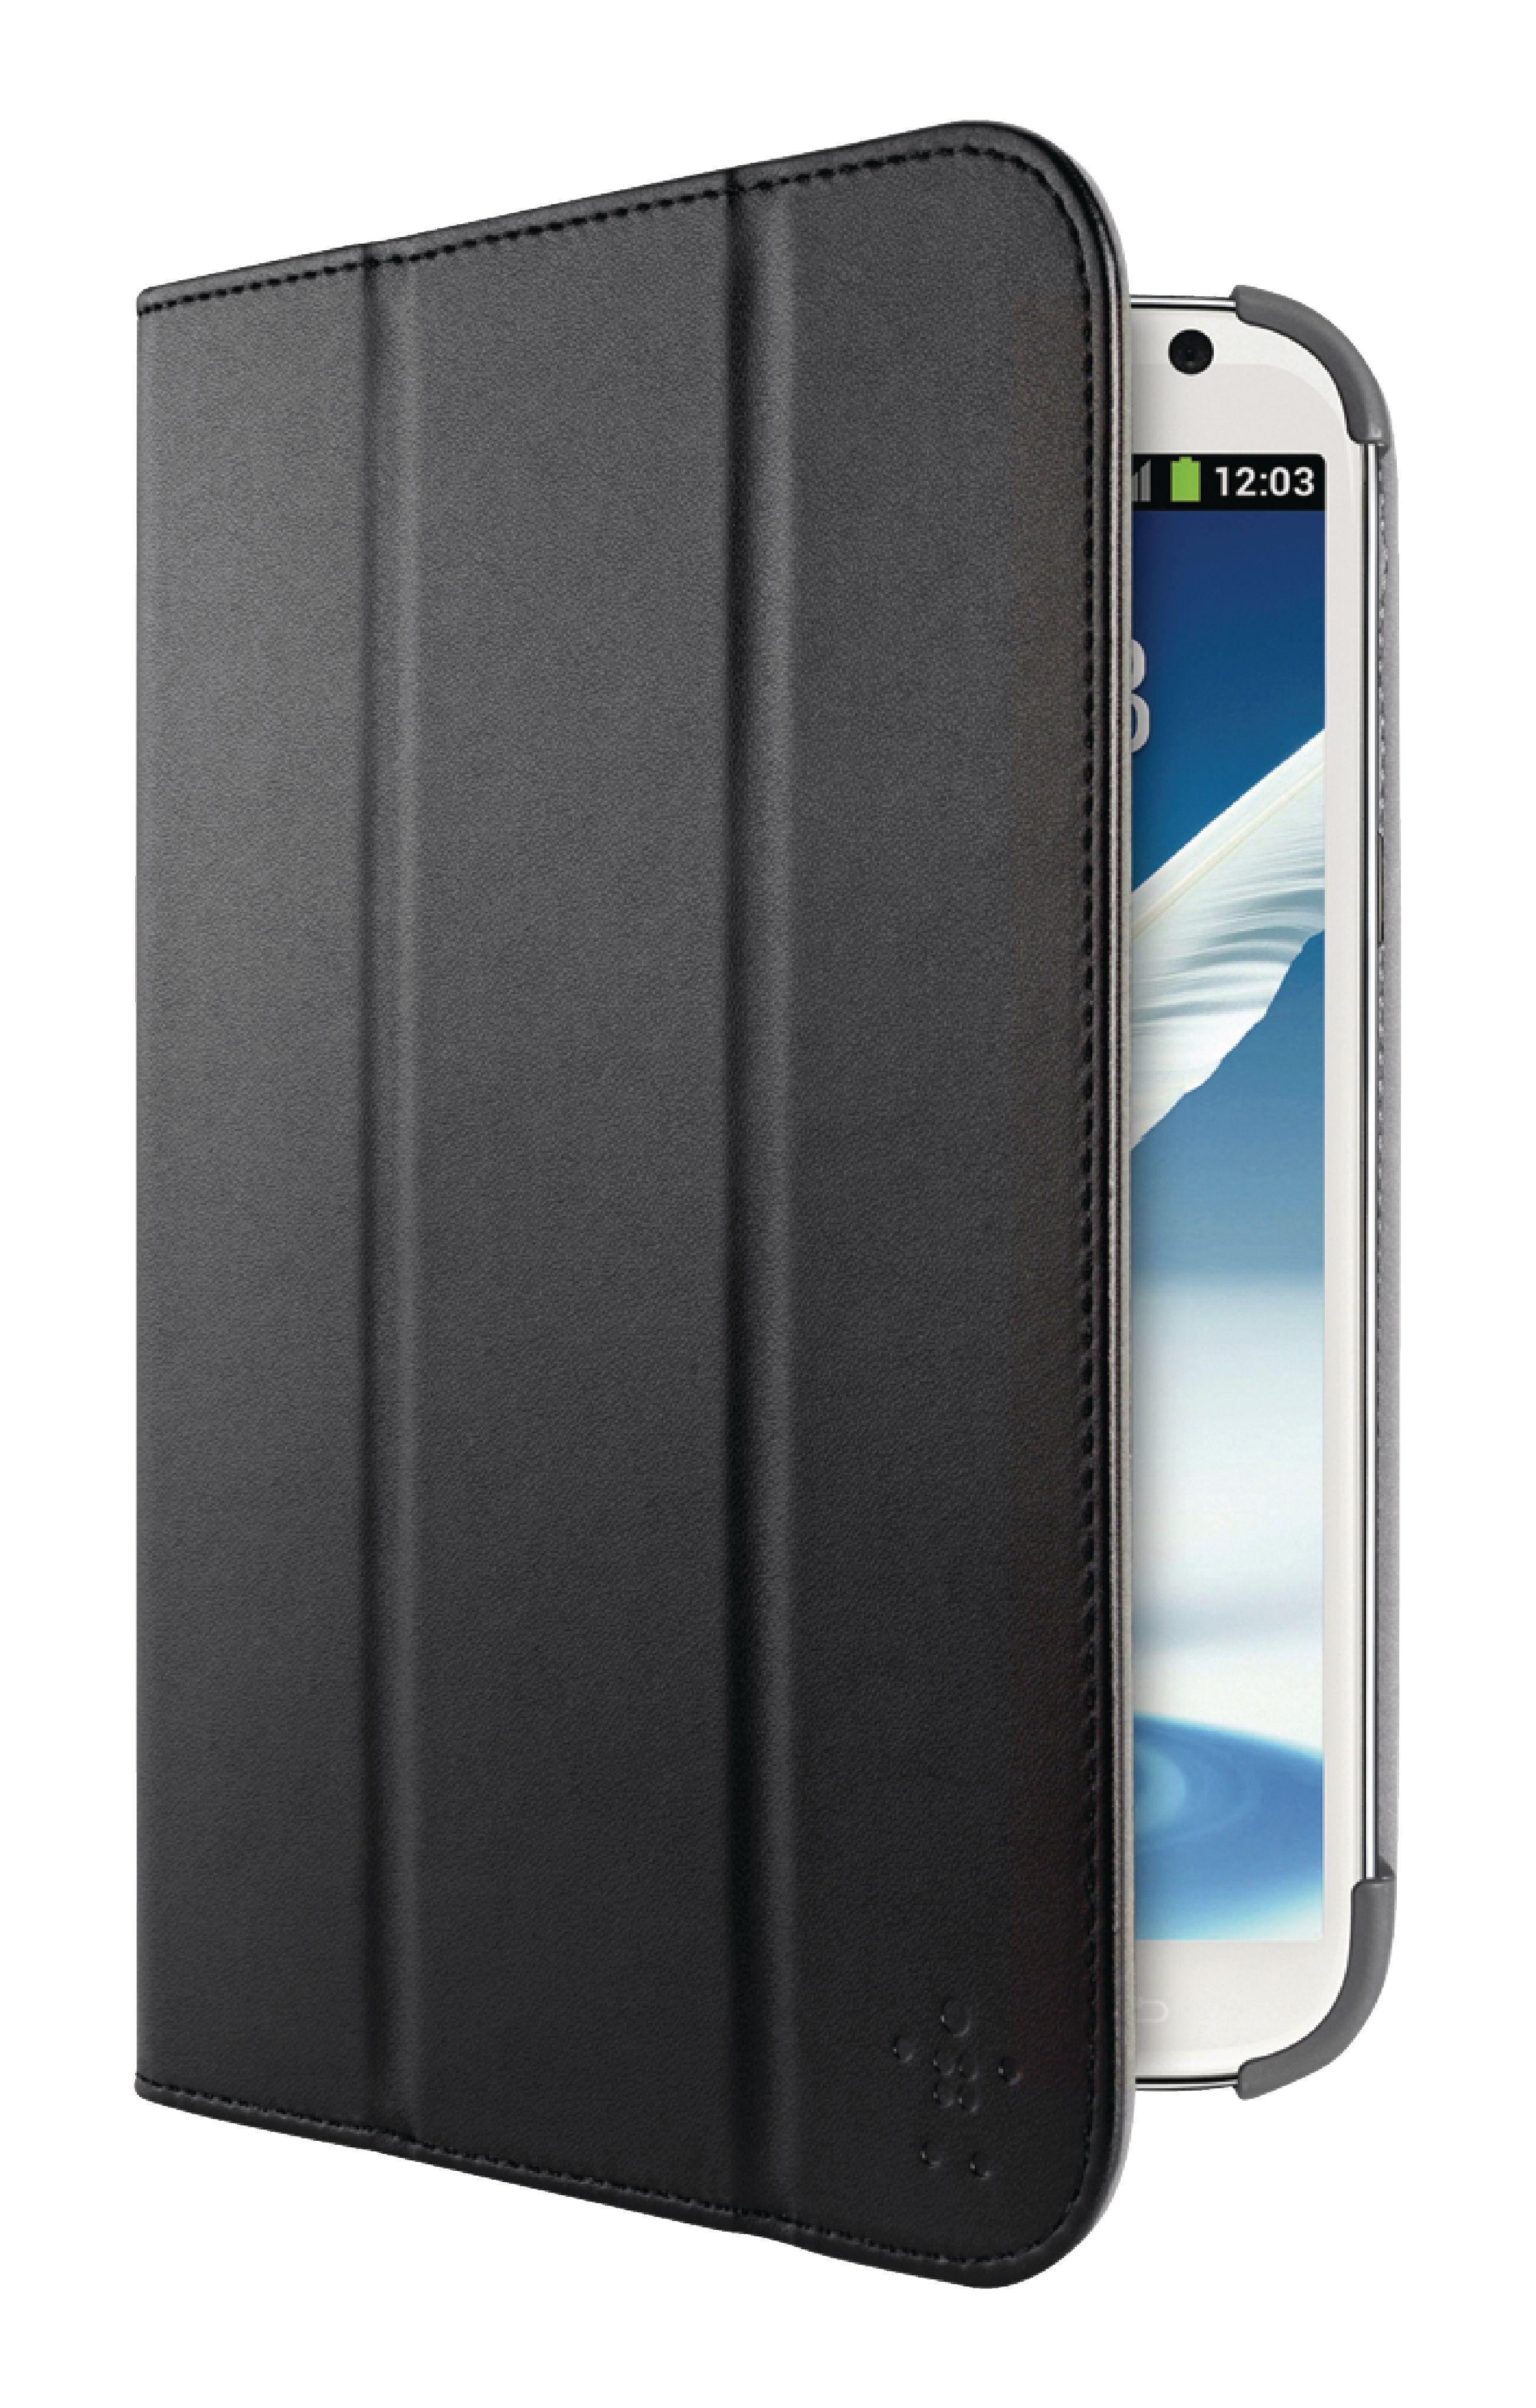 accbel00934b belkin etui de protection pour tablette portfolio samsung galaxy tab 3 8 noir. Black Bedroom Furniture Sets. Home Design Ideas